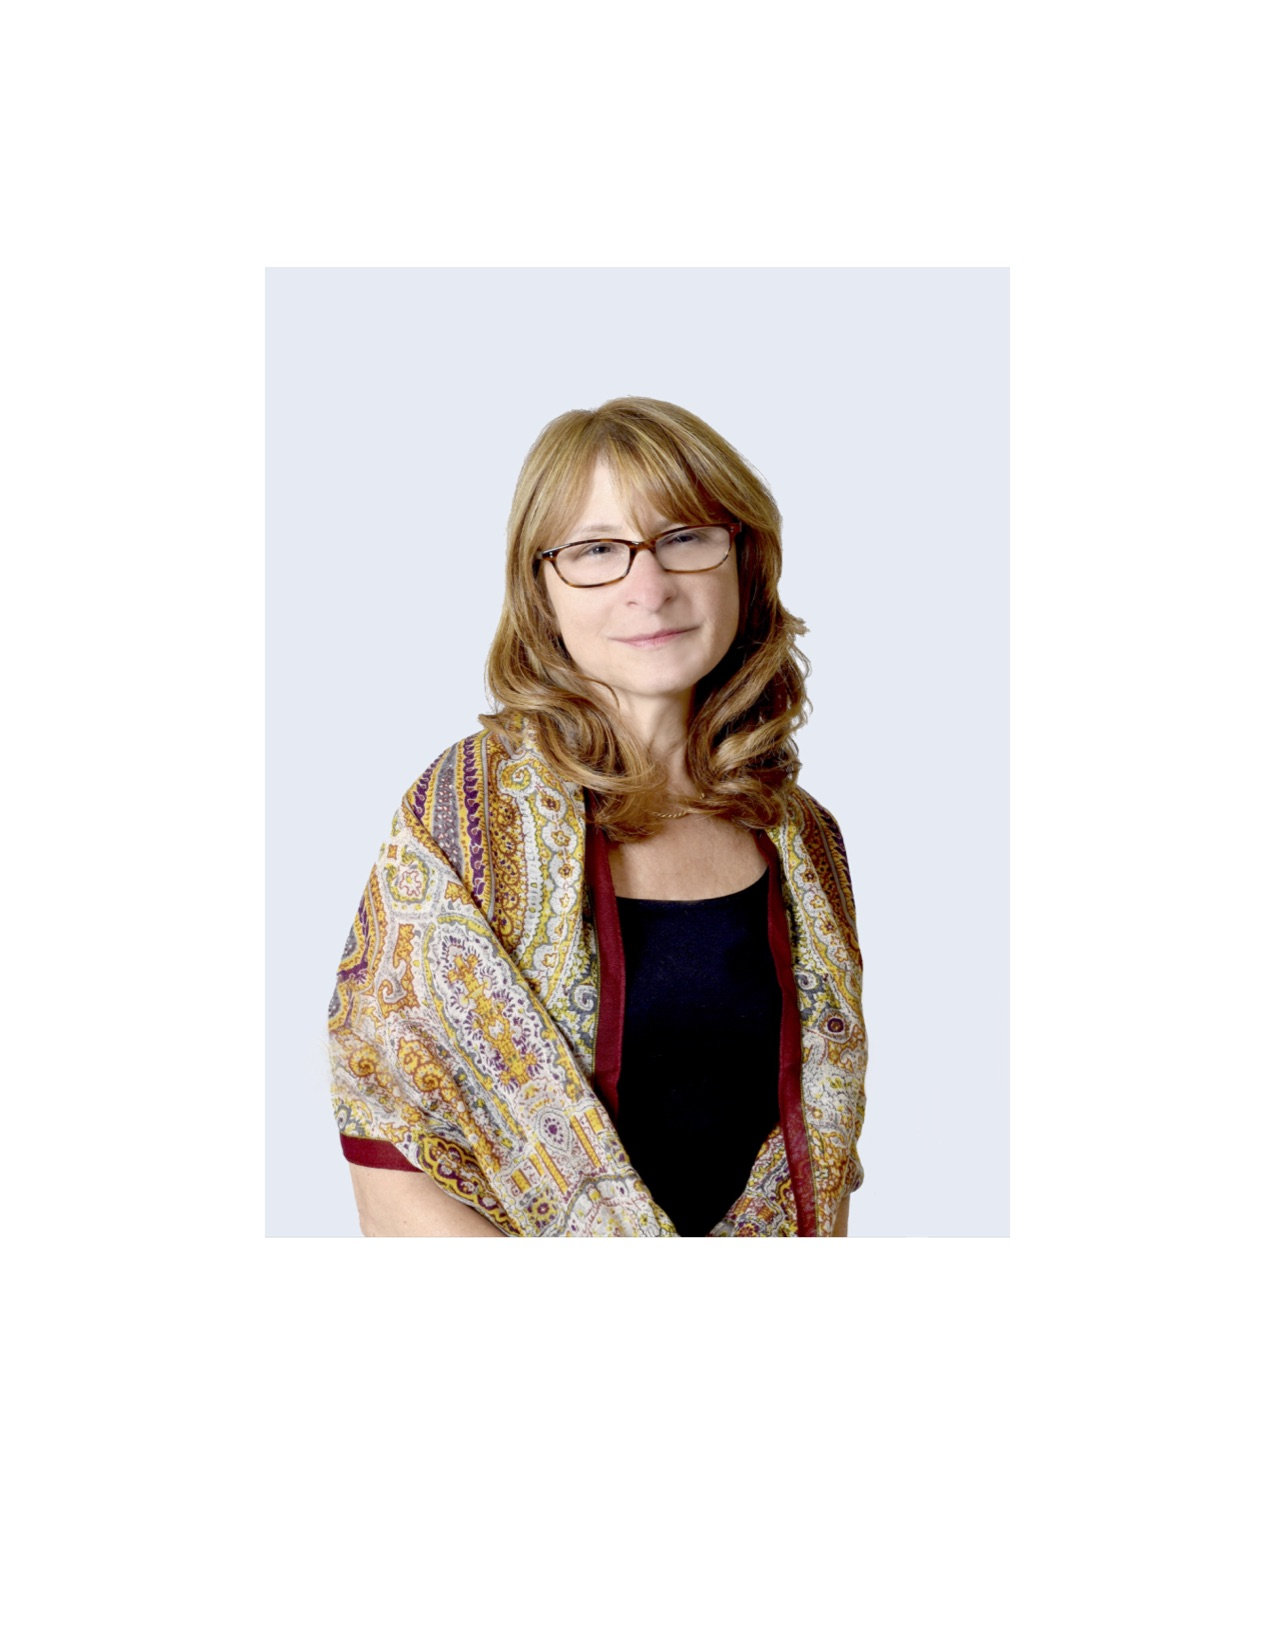 Rise Klein, CNM (Certified Nurse Midwife